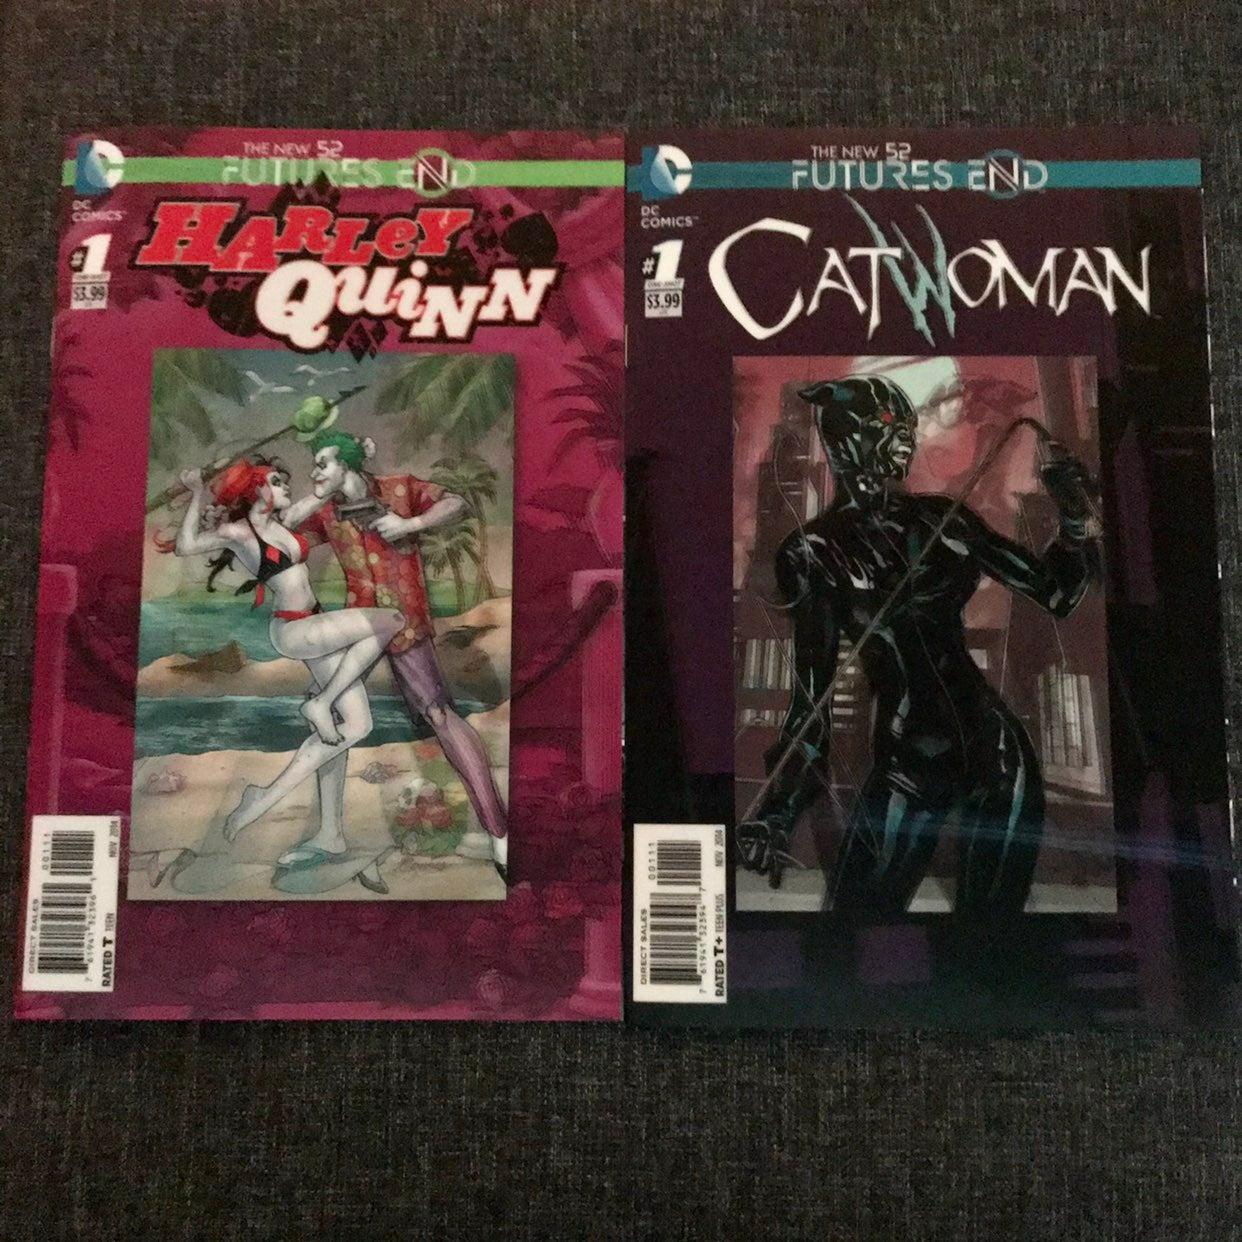 Catwoman & Harley Quinn comic bundle